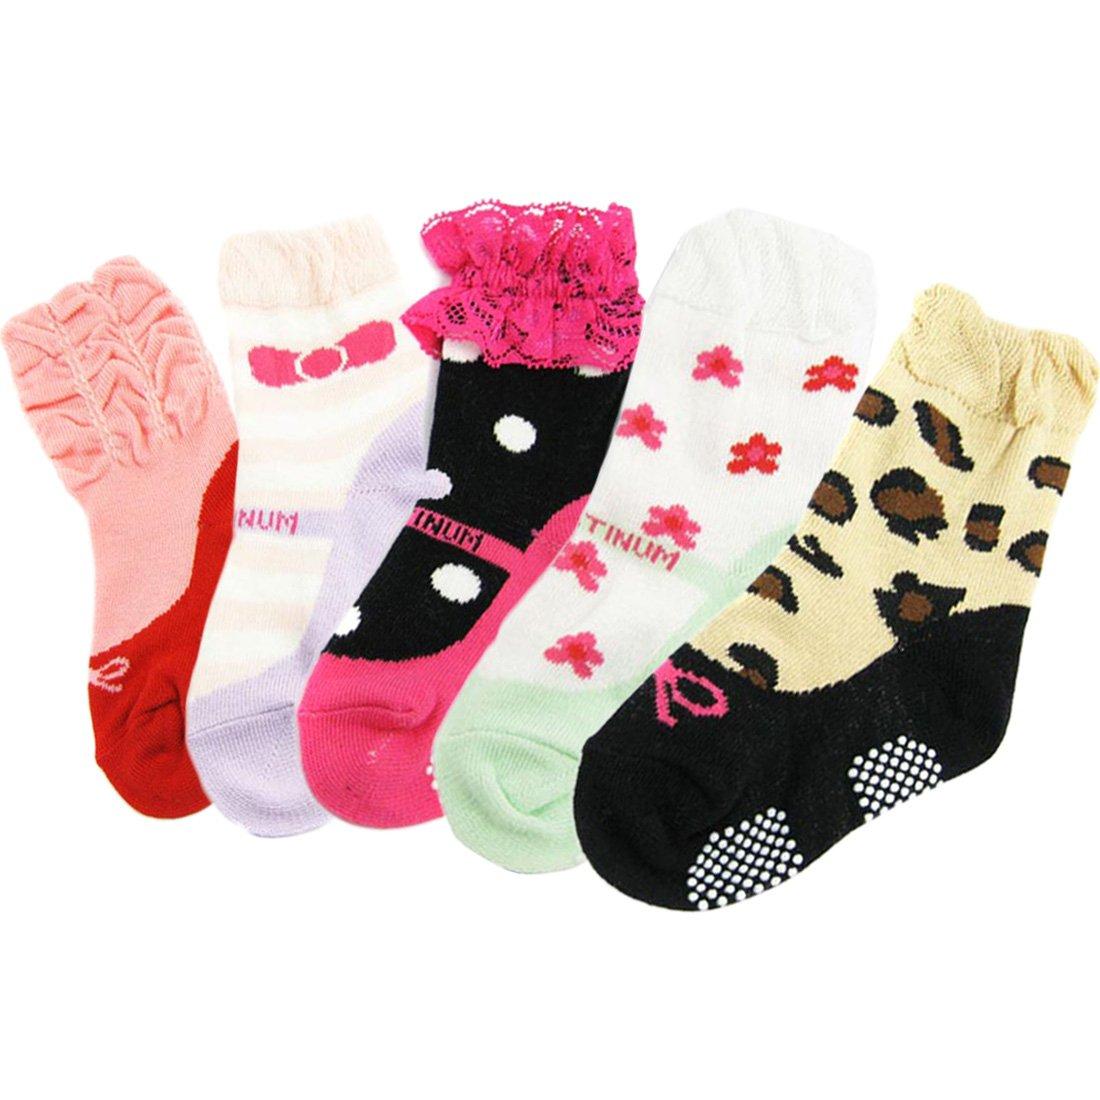 KF Baby Non-Skid Baby Girl Ruffle Lace Shoe Socks, 5 pairs (6 - 18 Months) kilofly